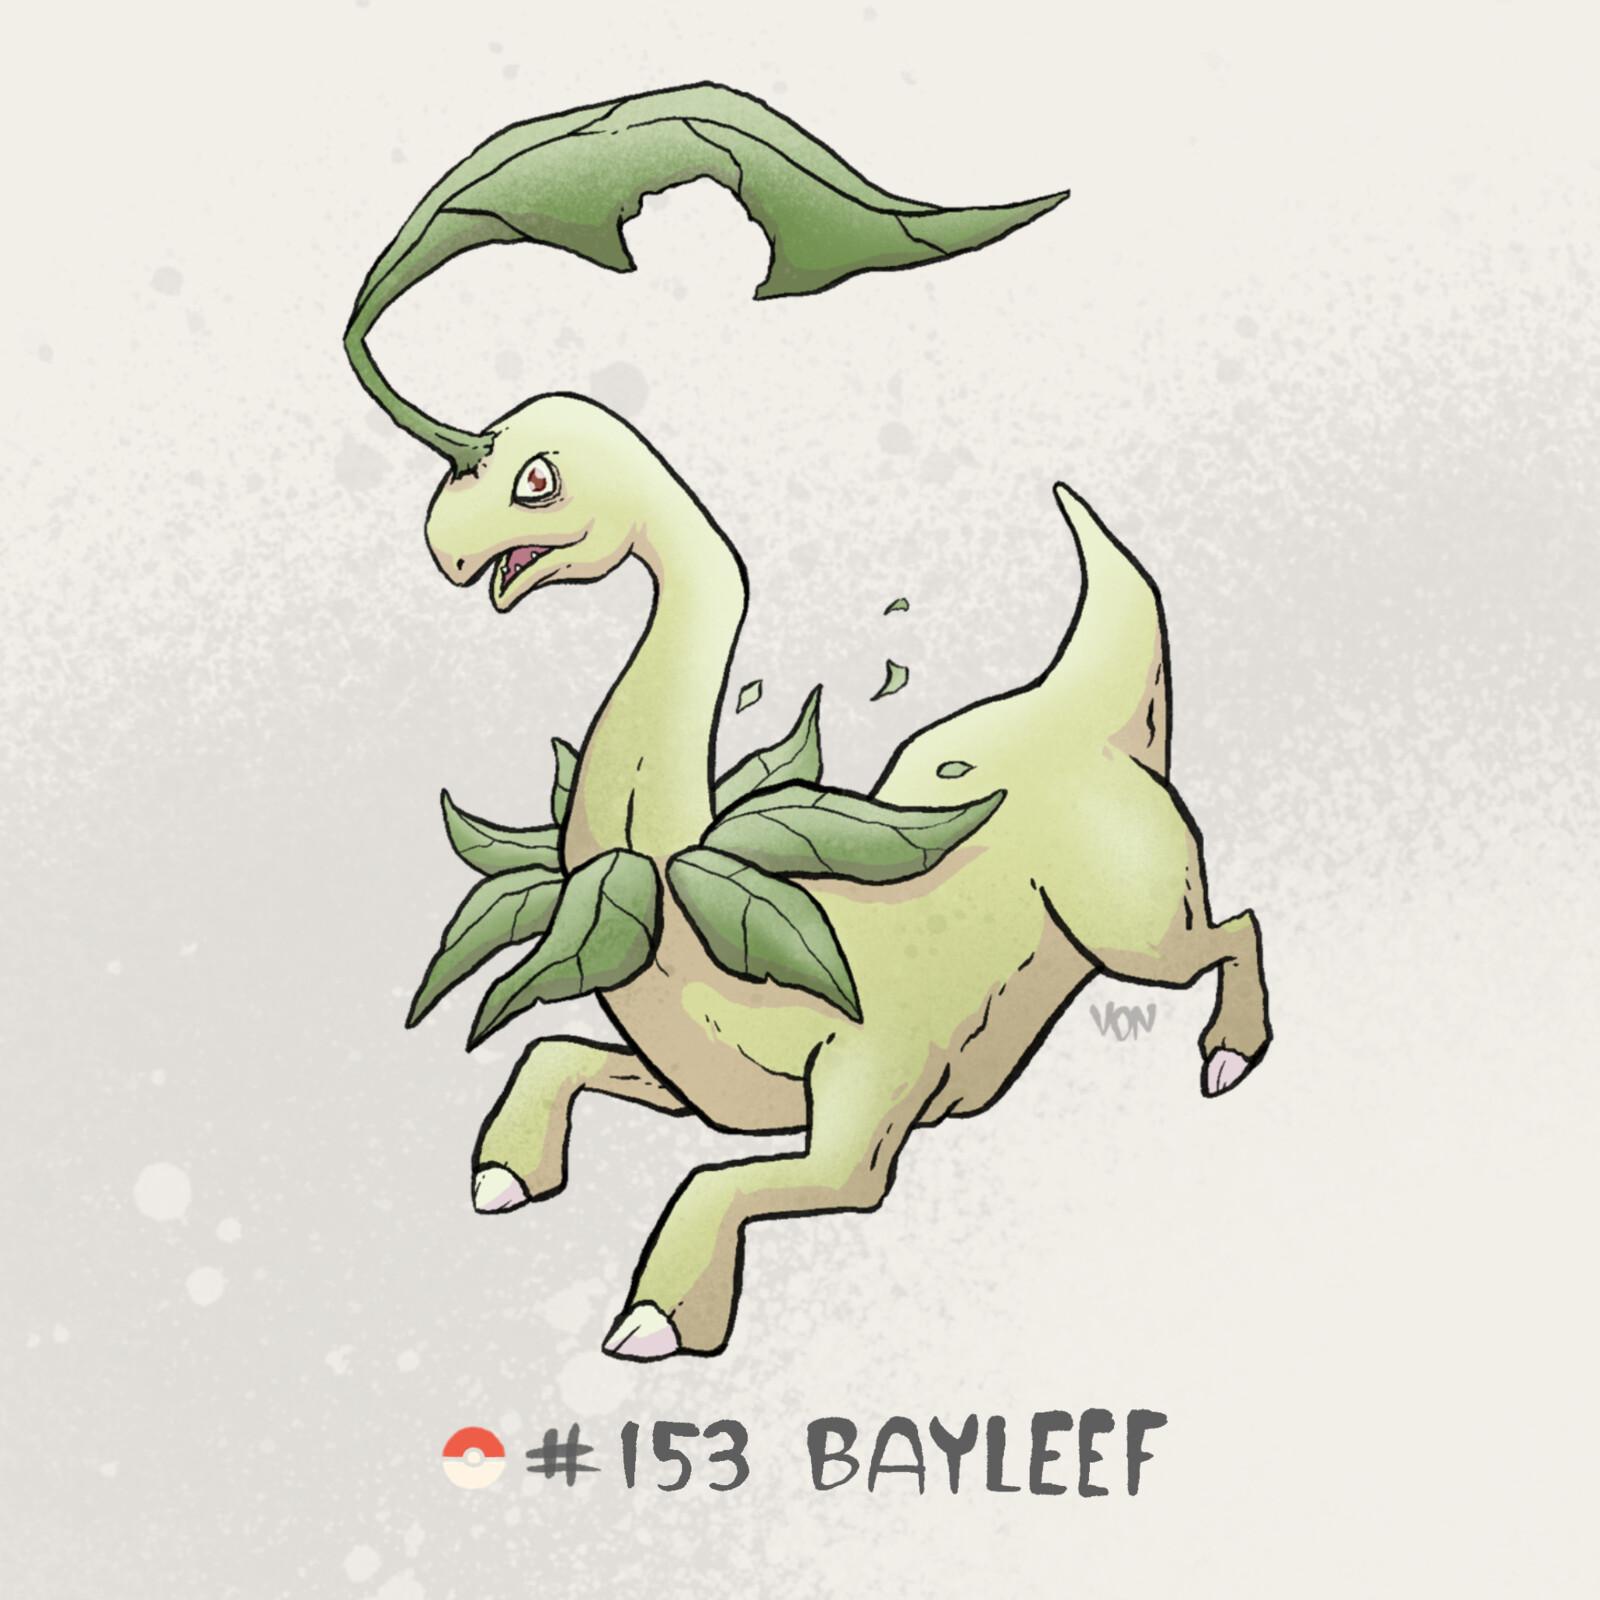 #153 Bayleef